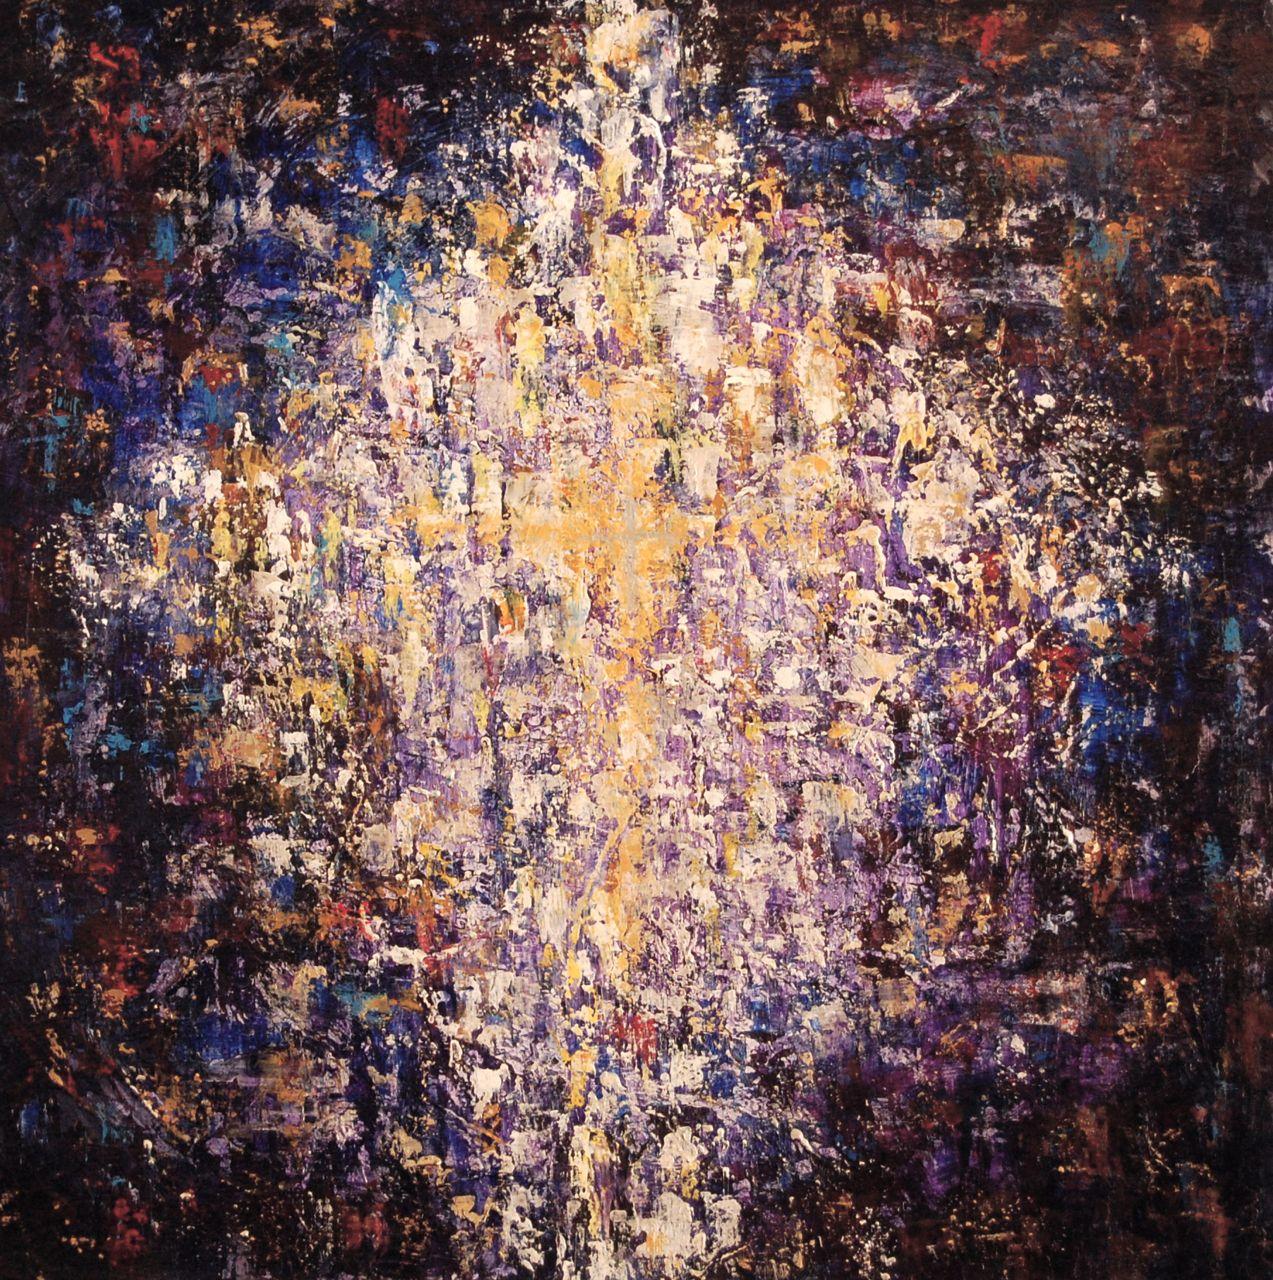 inspirational art, prophetic art, original painting